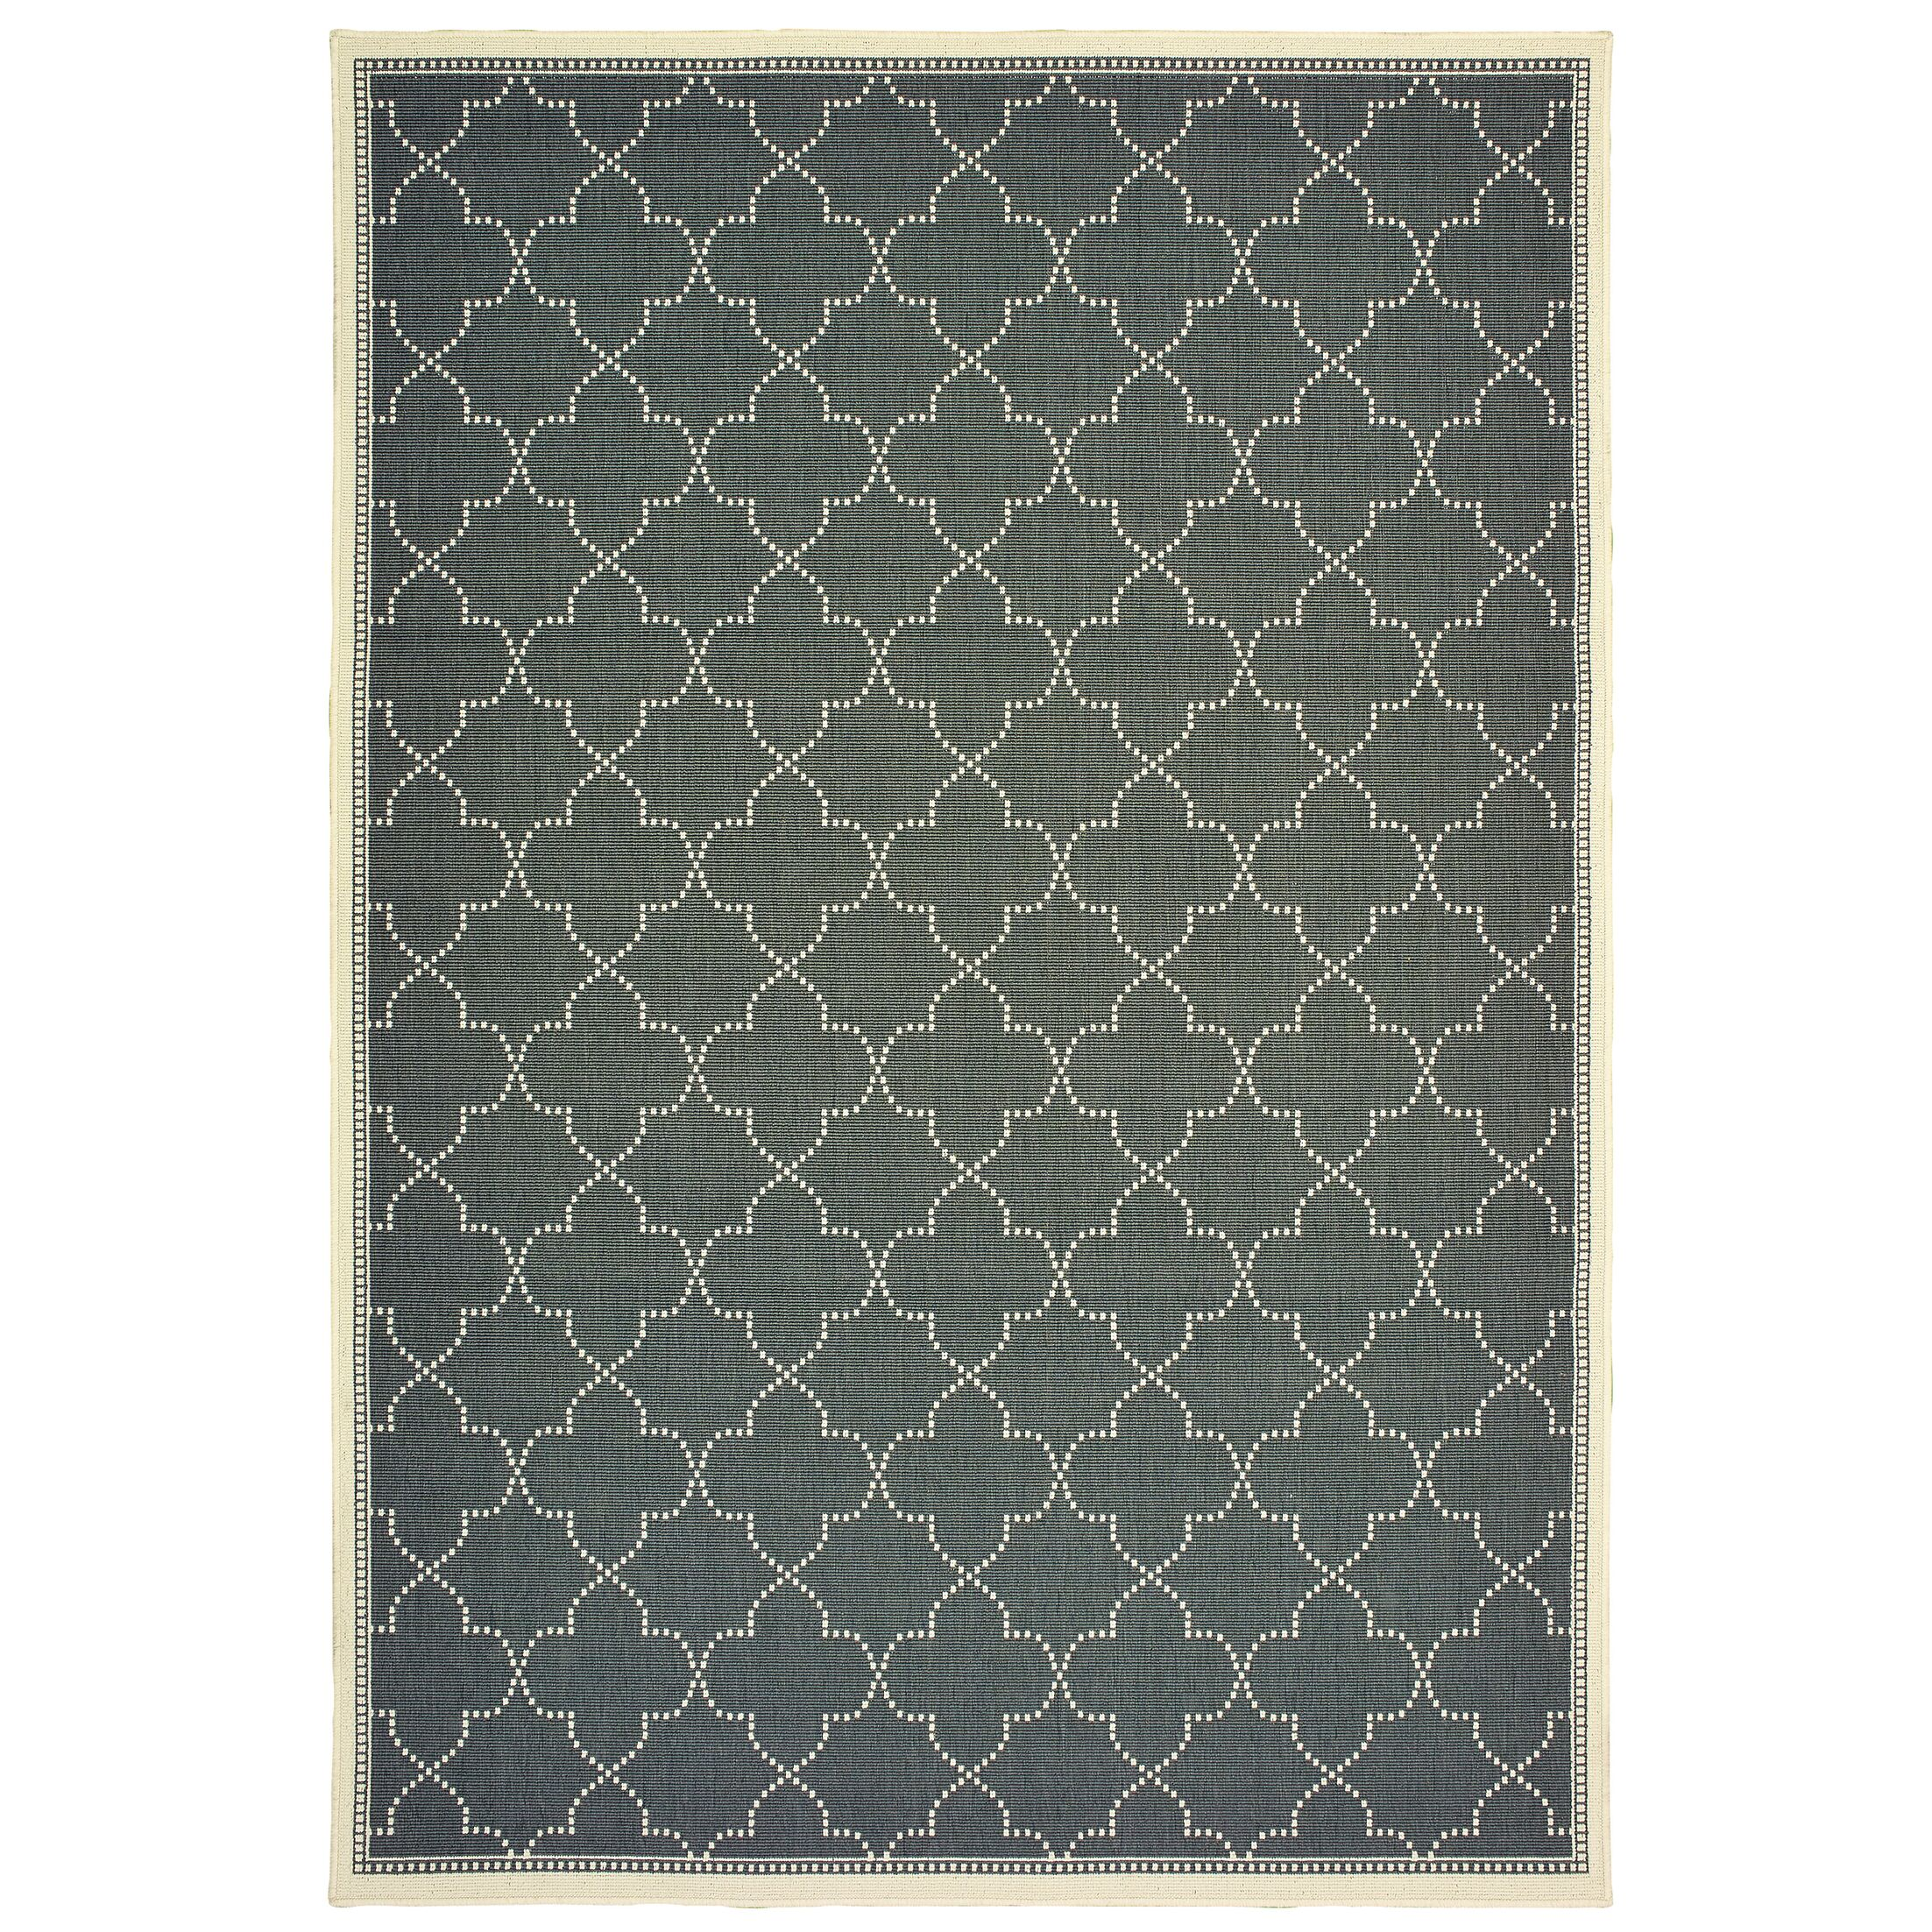 Salerno Simple Lattice Gray Indoor/Outdoor Area Rug Rug Size: Rectangle 7'10